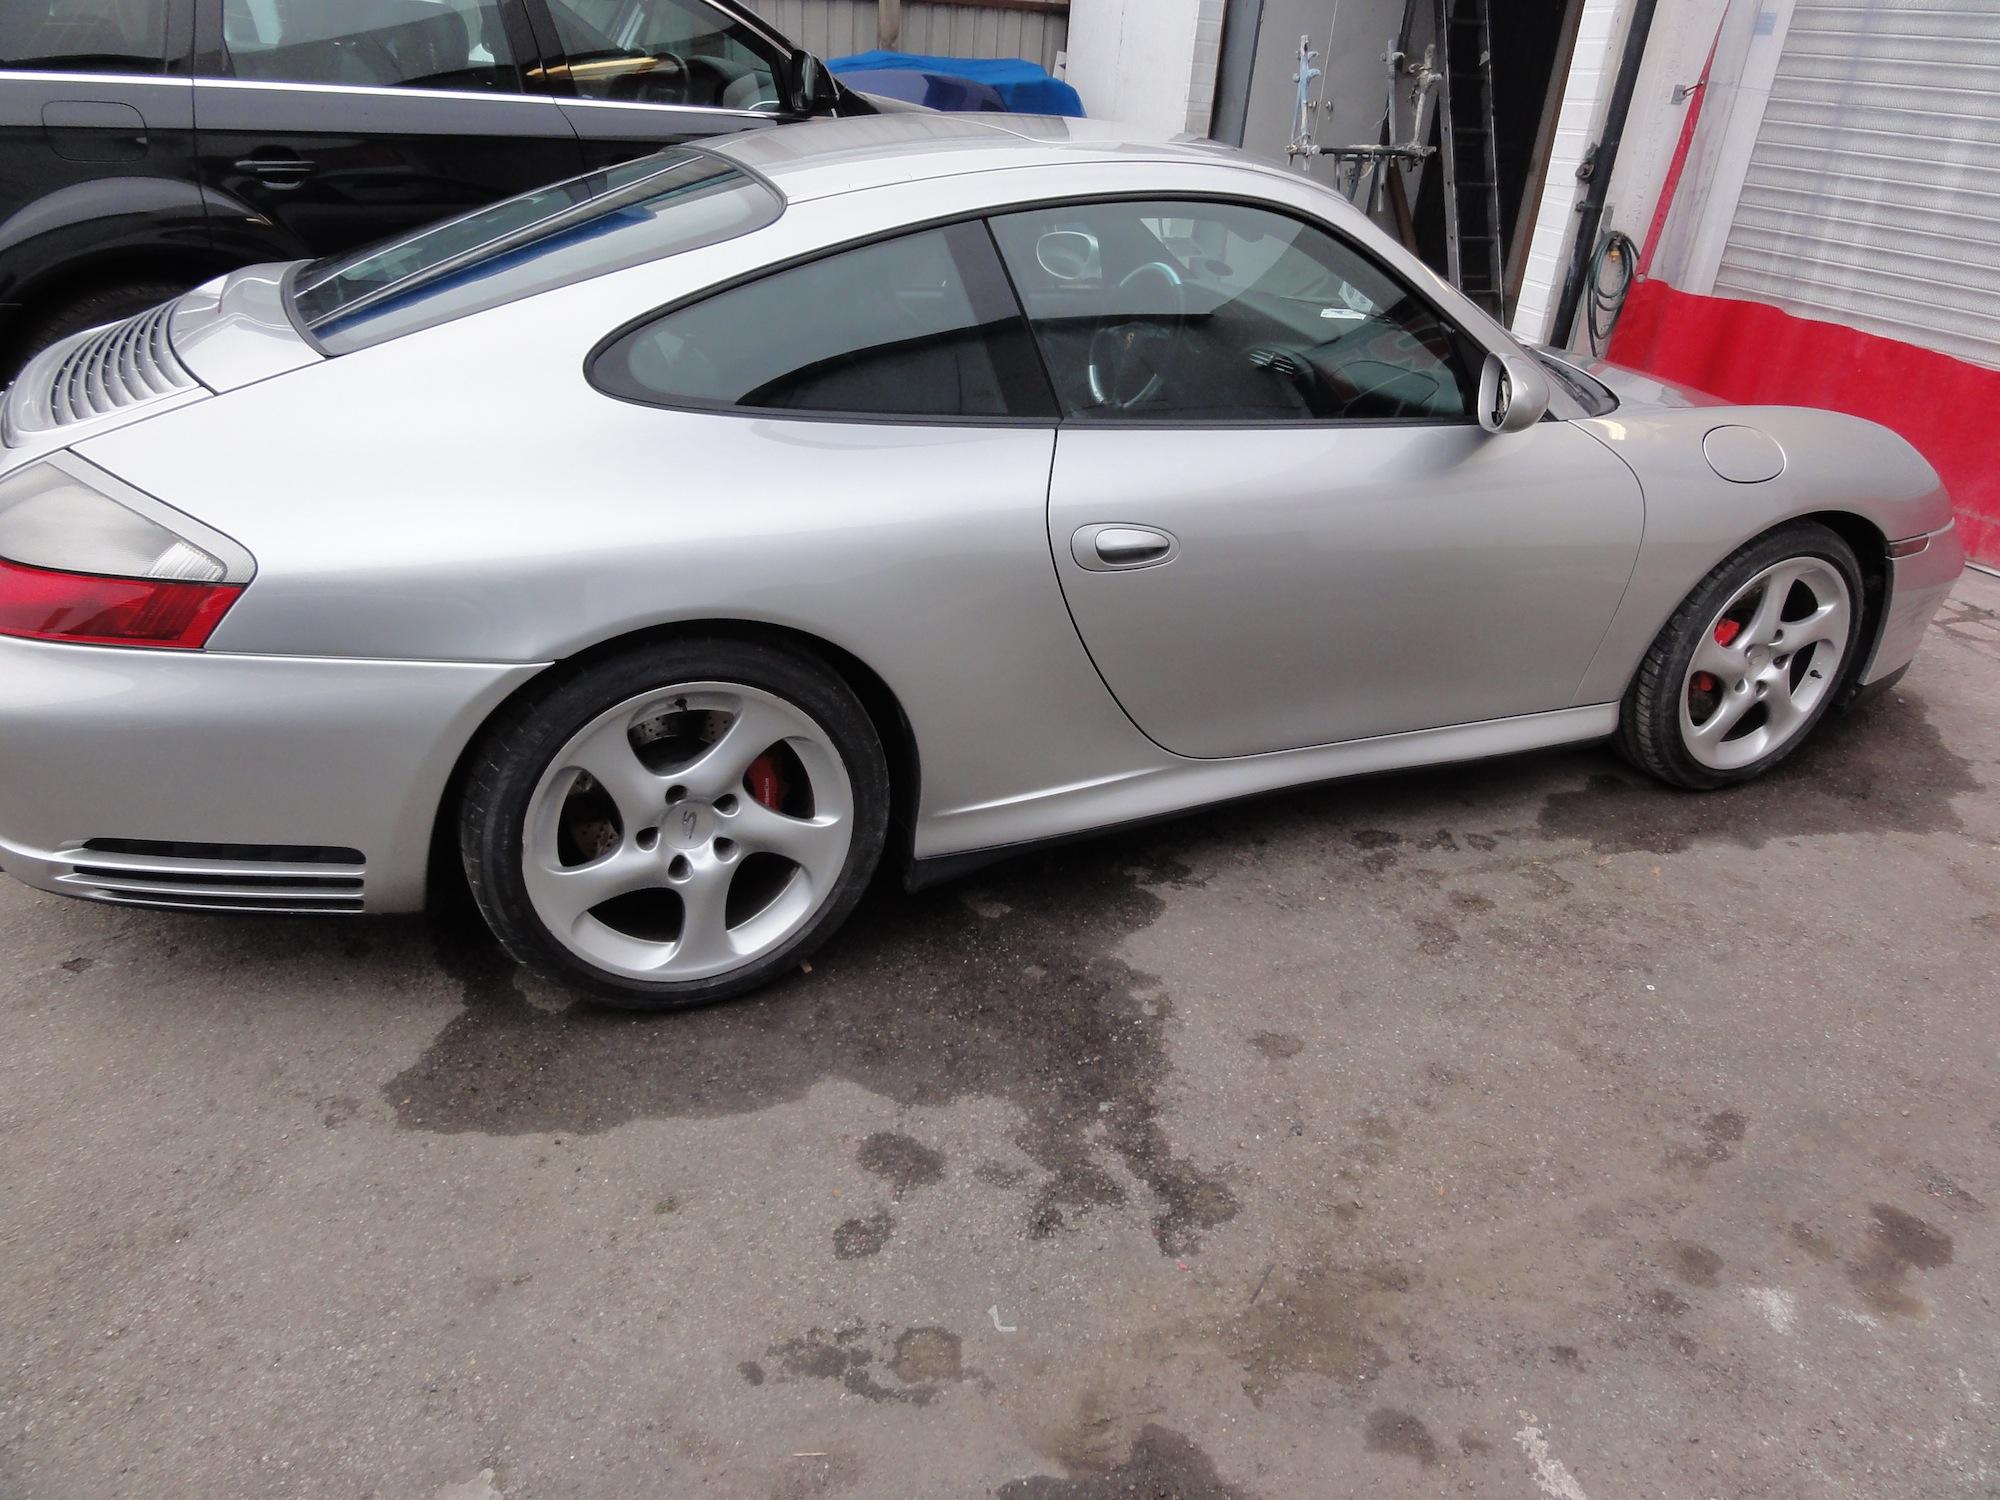 RT-Performance Porsche side repair Job terminated